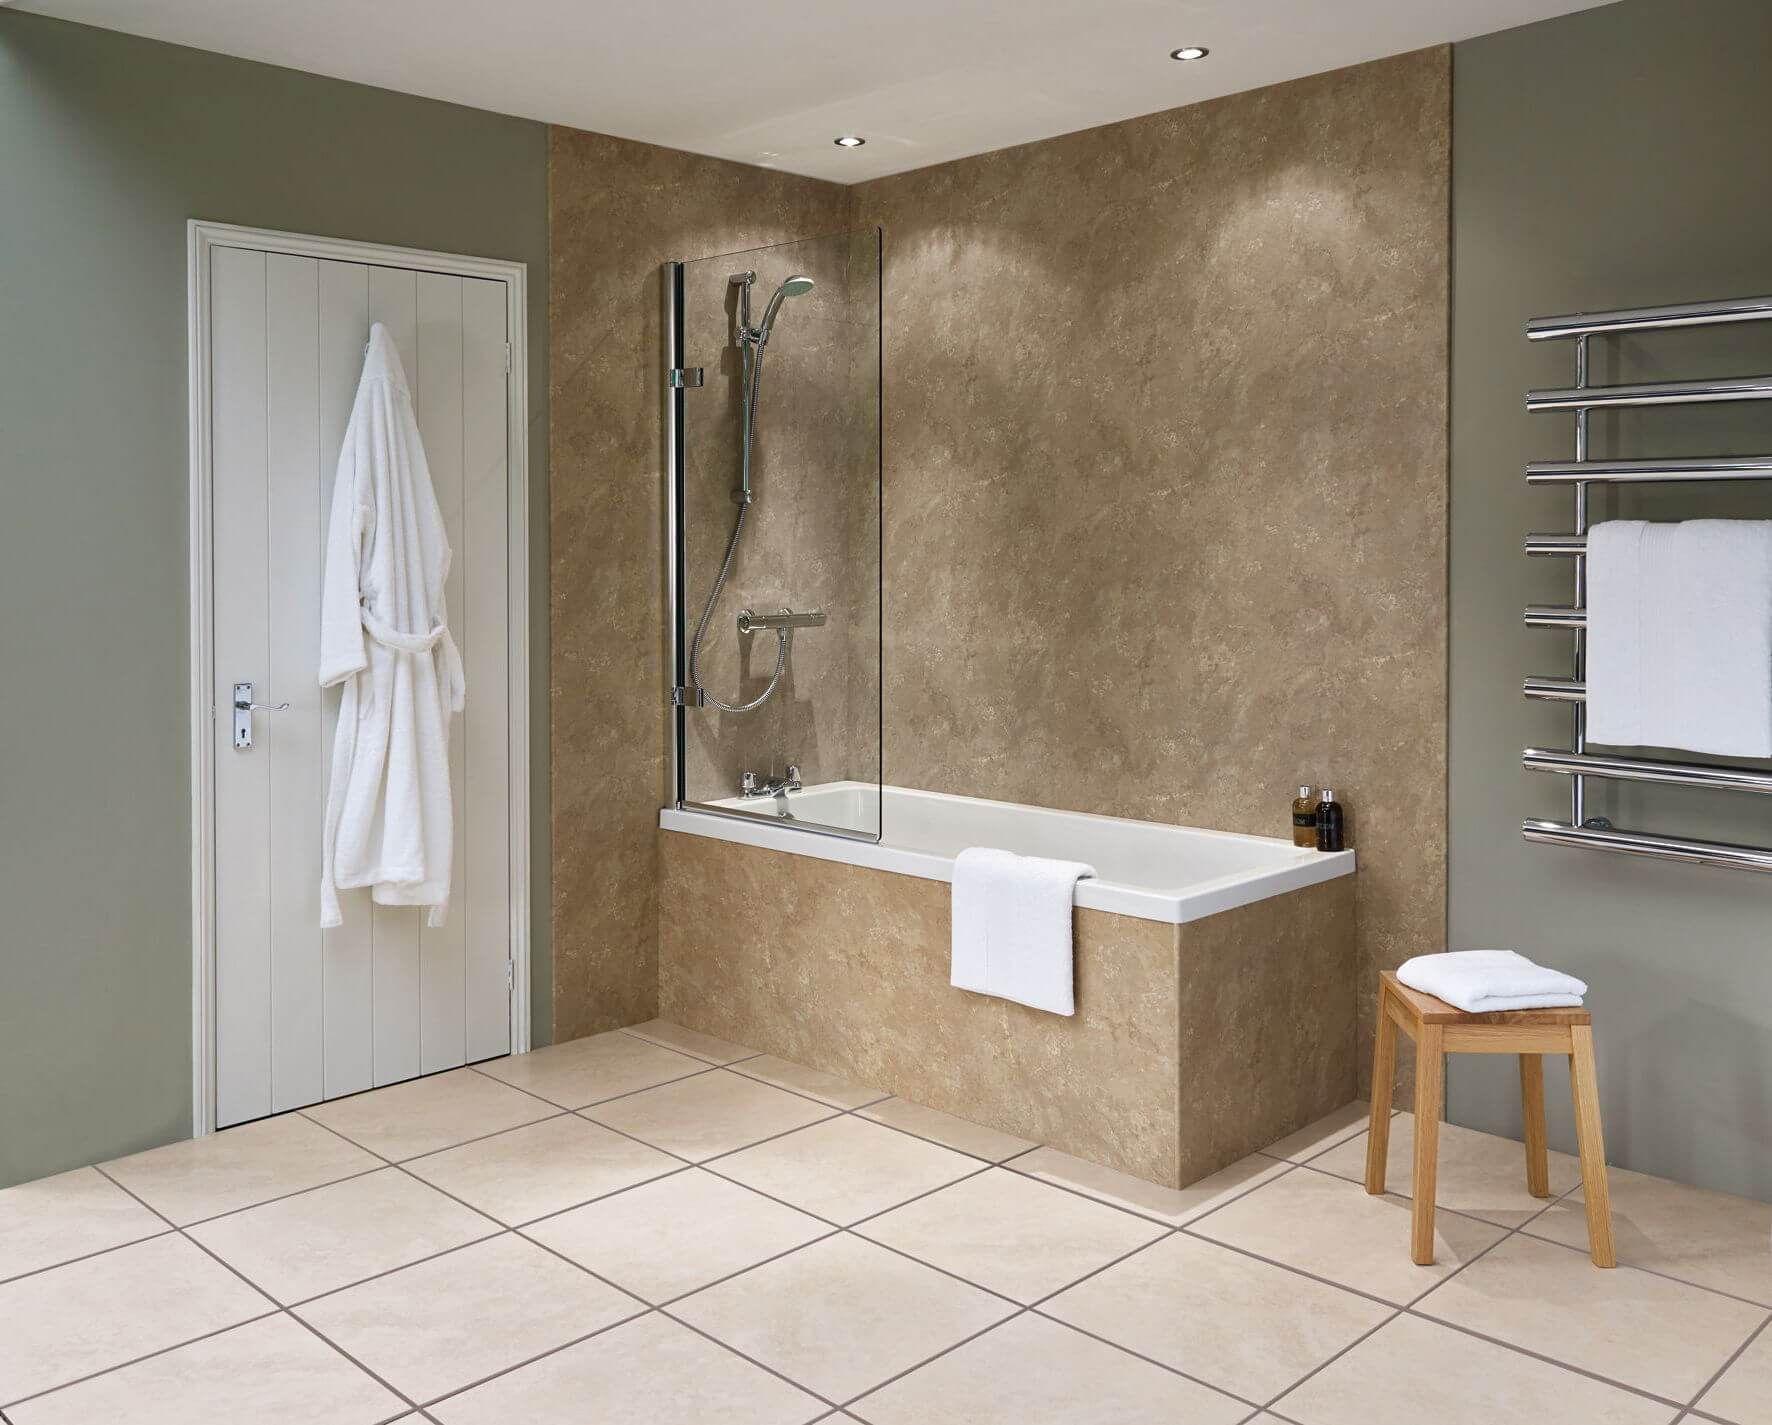 Image Result For Shower Panels Instead Of Tiles Bathroom Shower Panels Bathroom Paneling Shower Panels